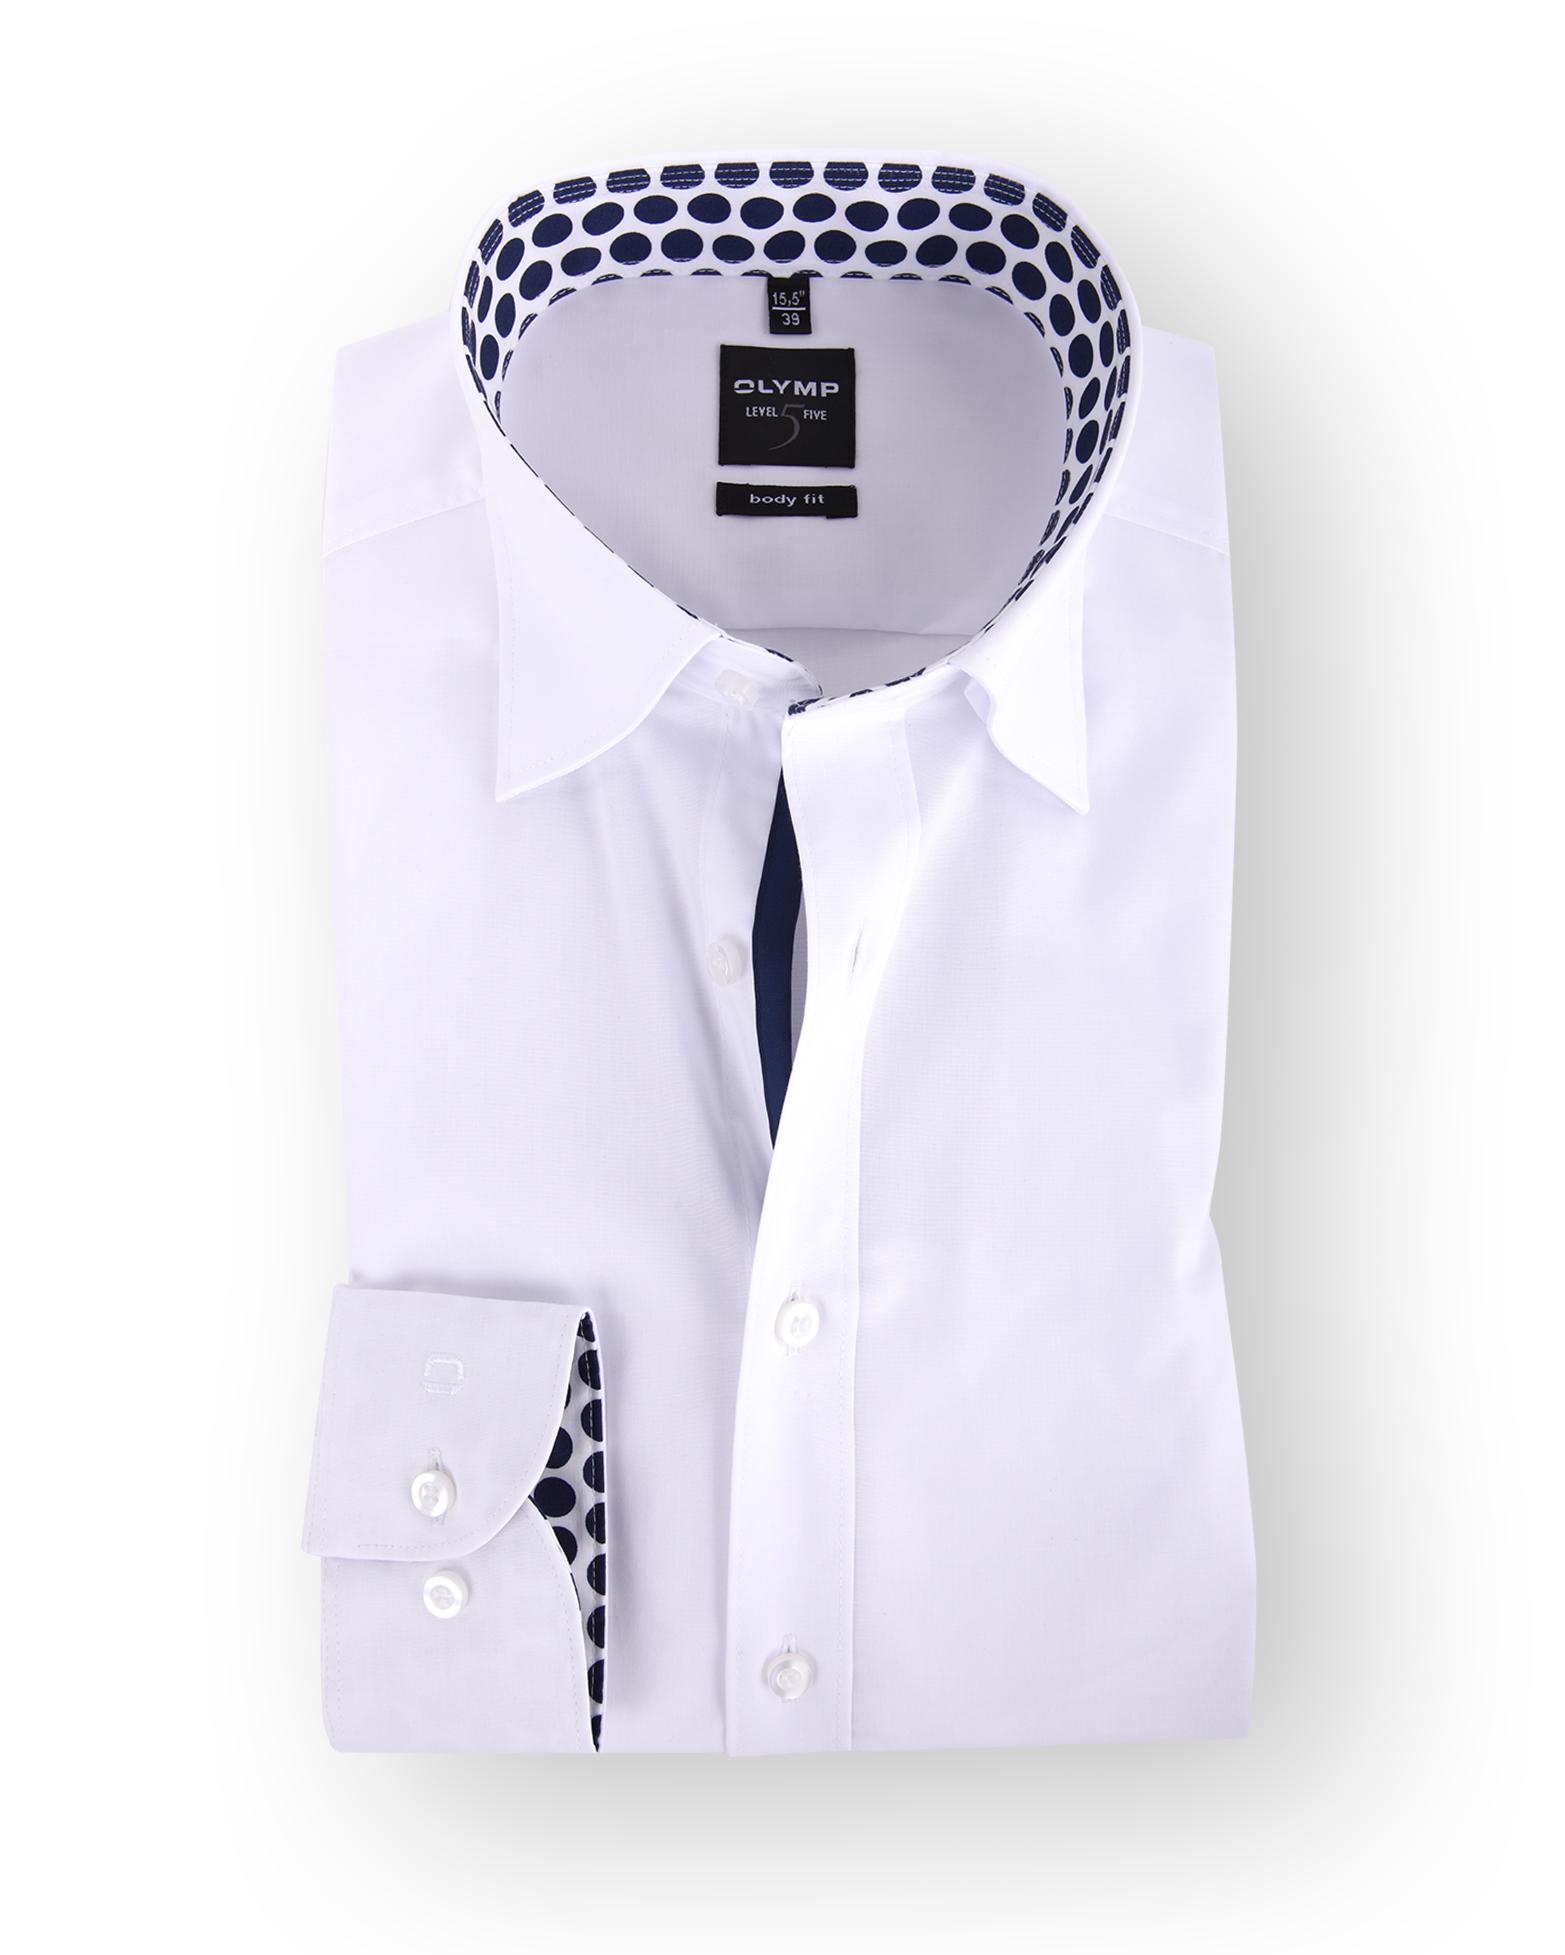 olymp body fit overhemd white dots. Black Bedroom Furniture Sets. Home Design Ideas